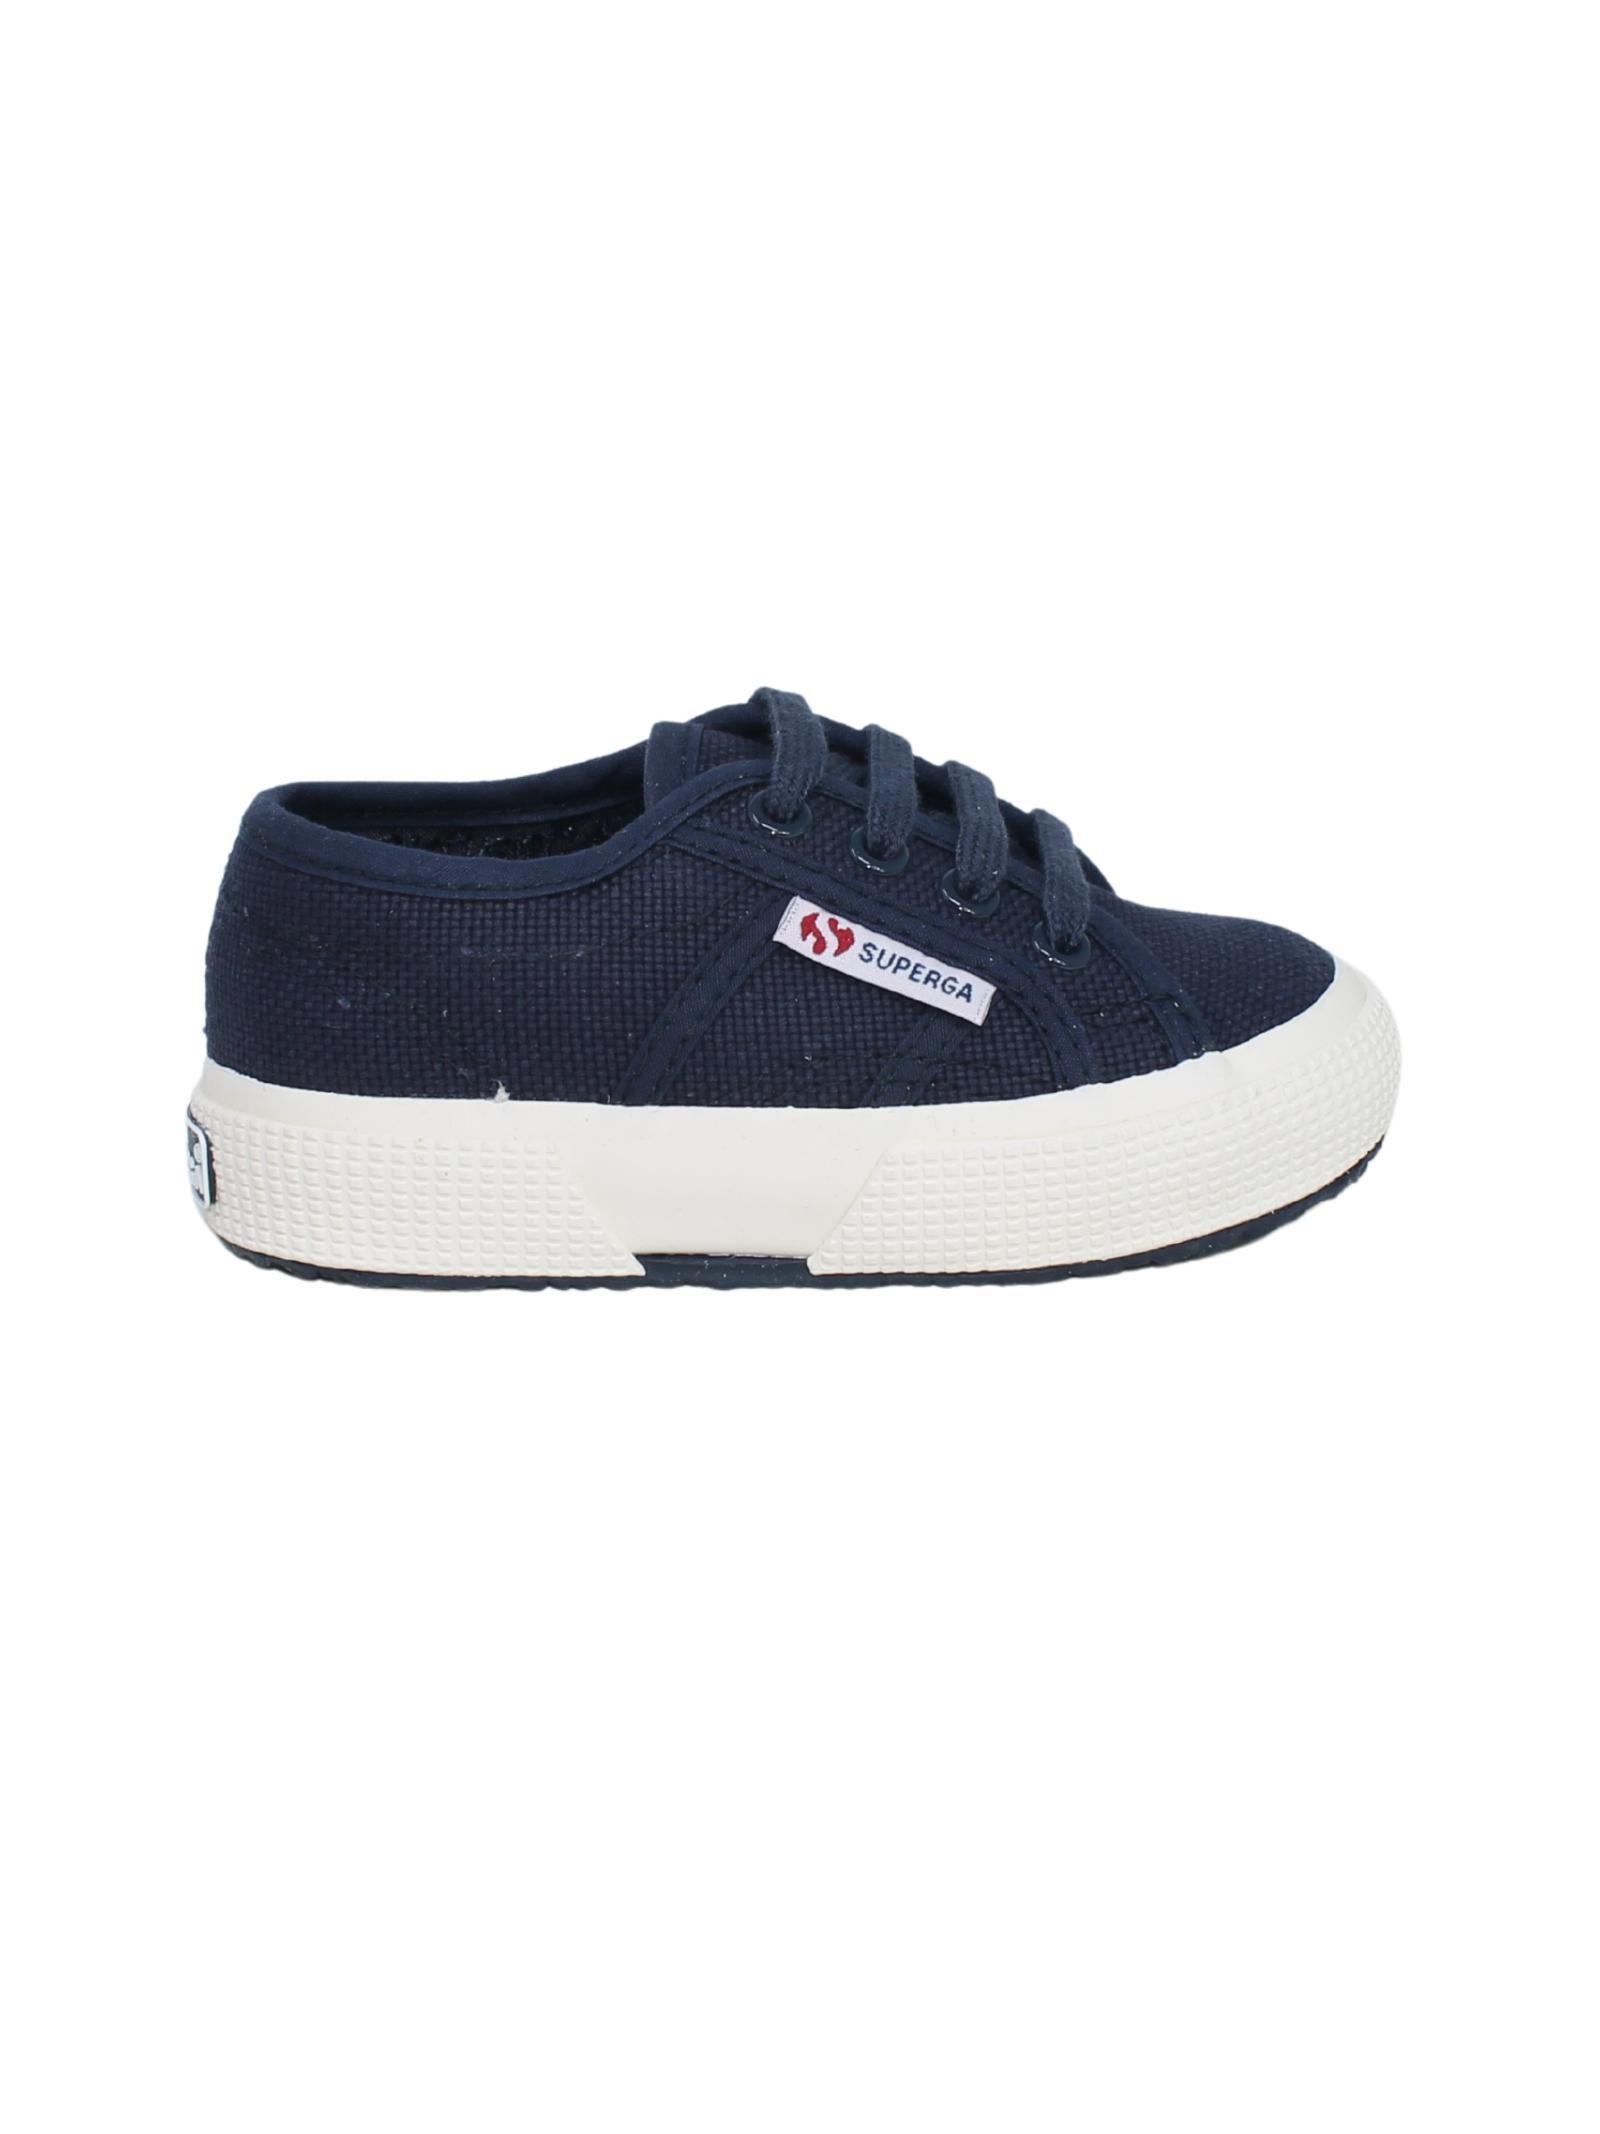 SUPERGA KIDS | Sneakers | 2750S00005P0933